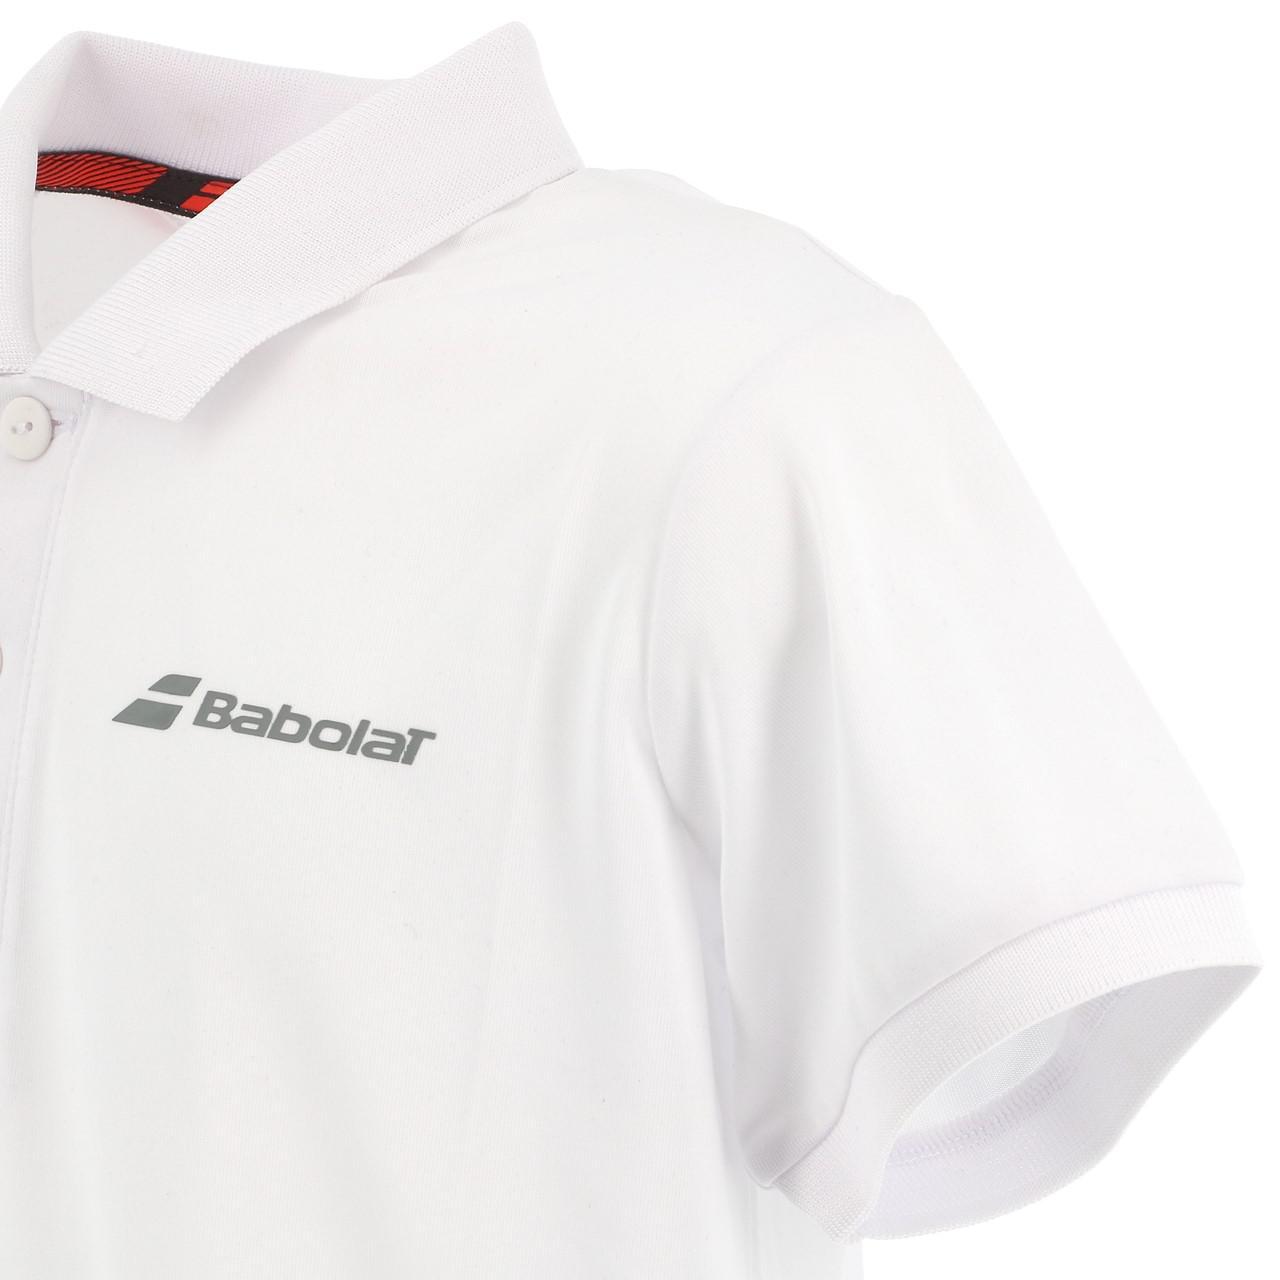 Polo-Von-Tennis-Babolat-Polo-Kind-Weiss-Weiss-71214-Neu Indexbild 3